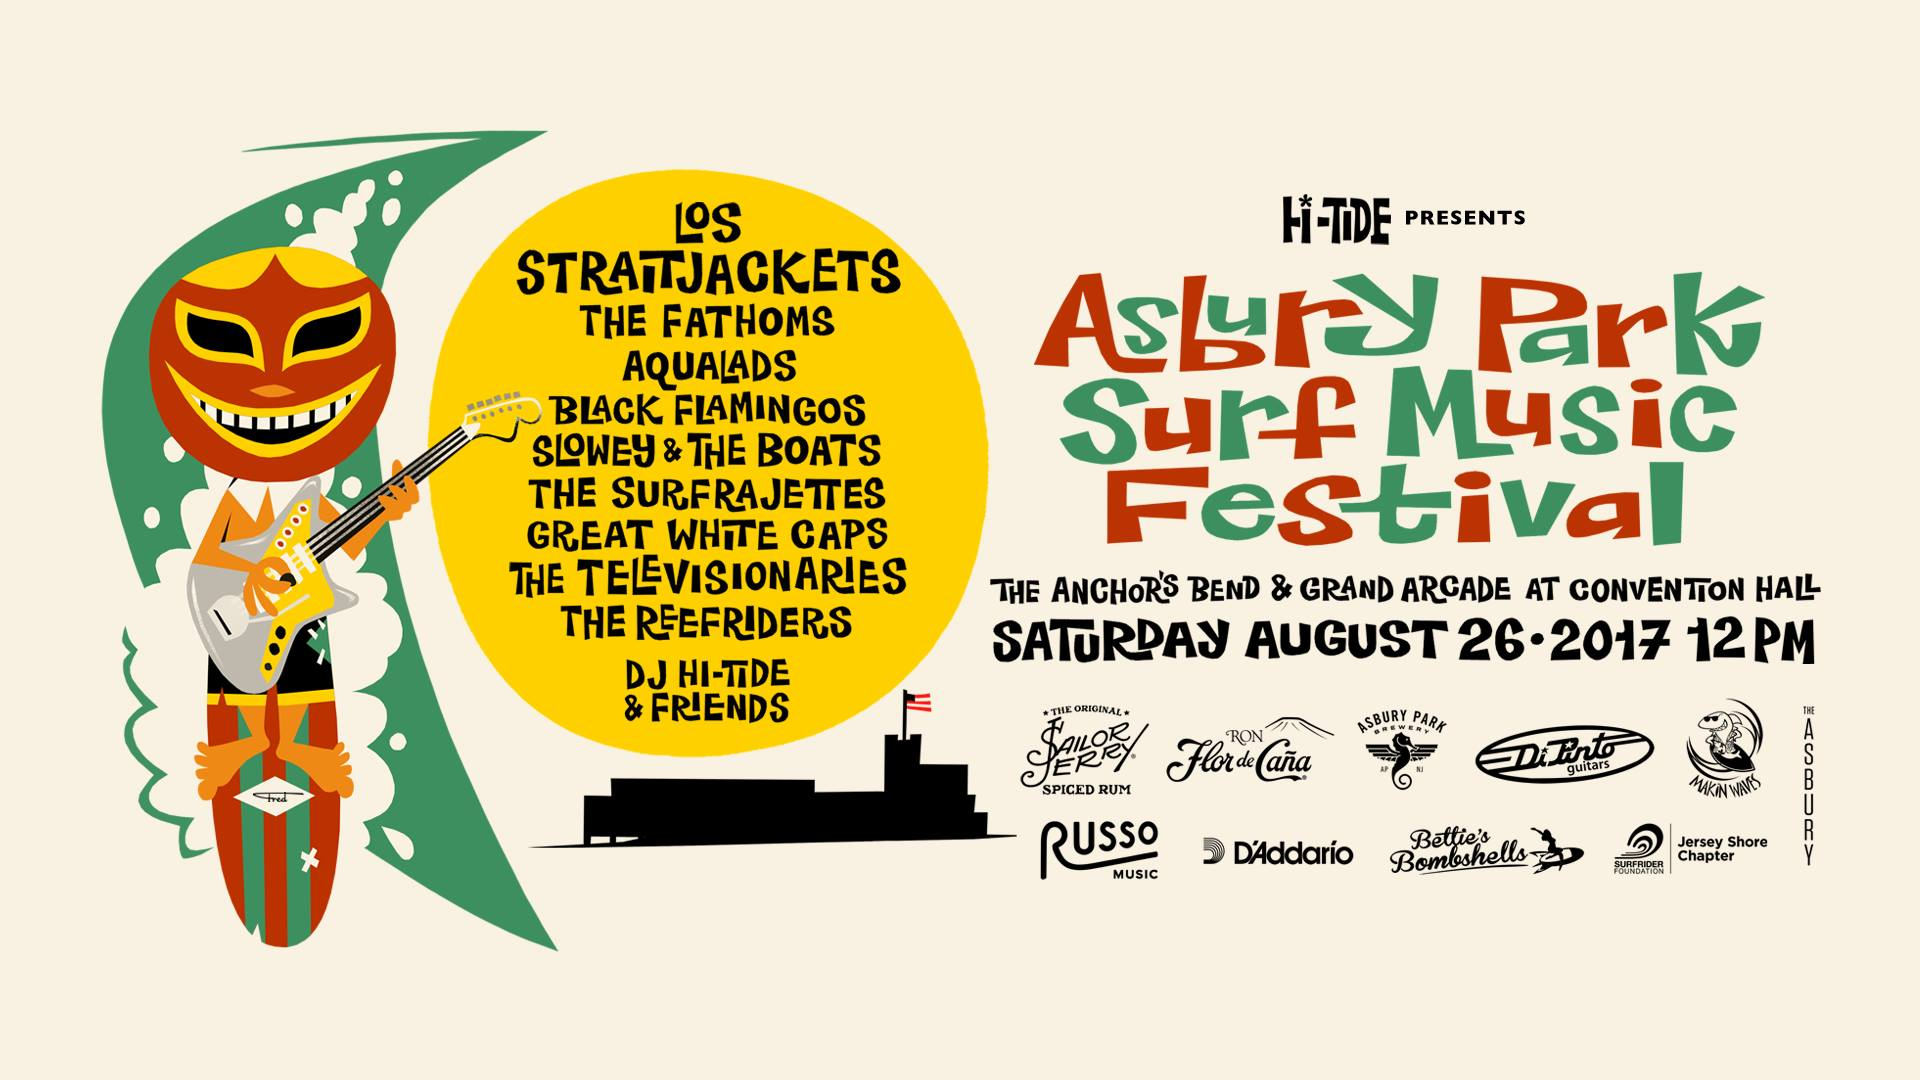 Asbury Park Surf Music Festival.jpg